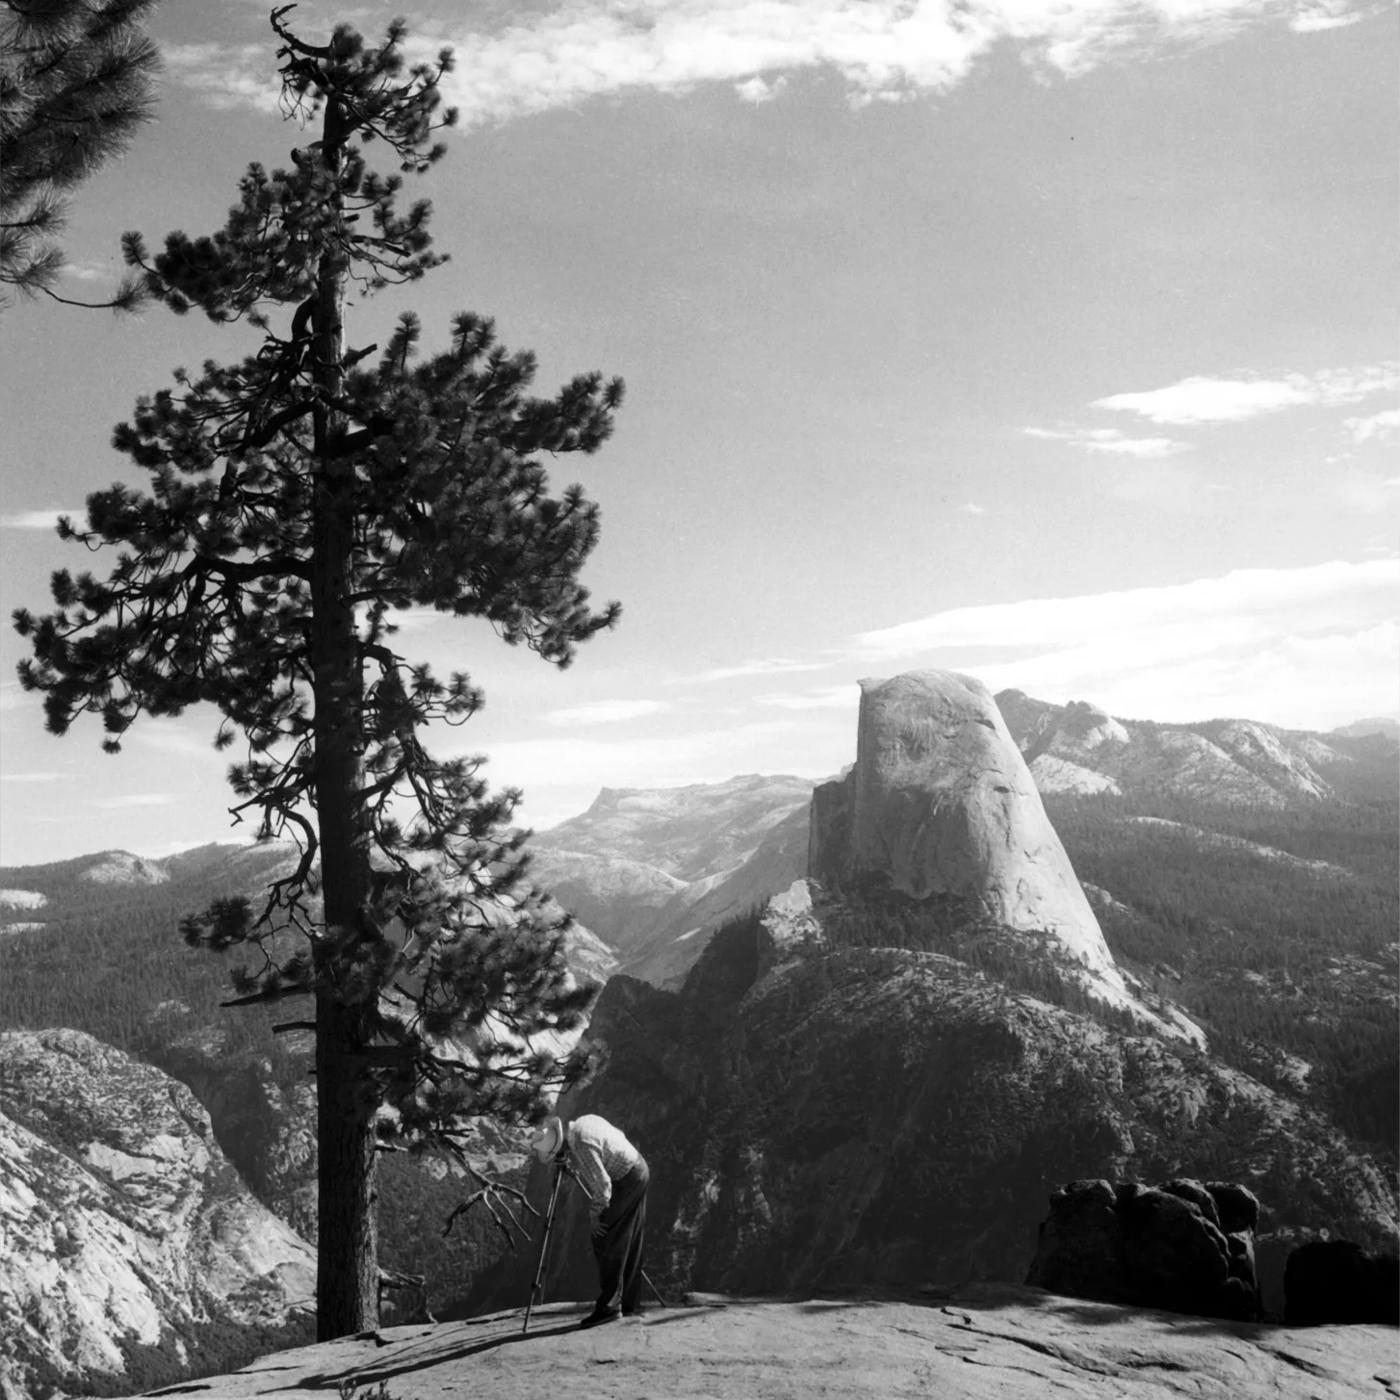 Imogen Cunningham Ansel Adams Yosemite 1953